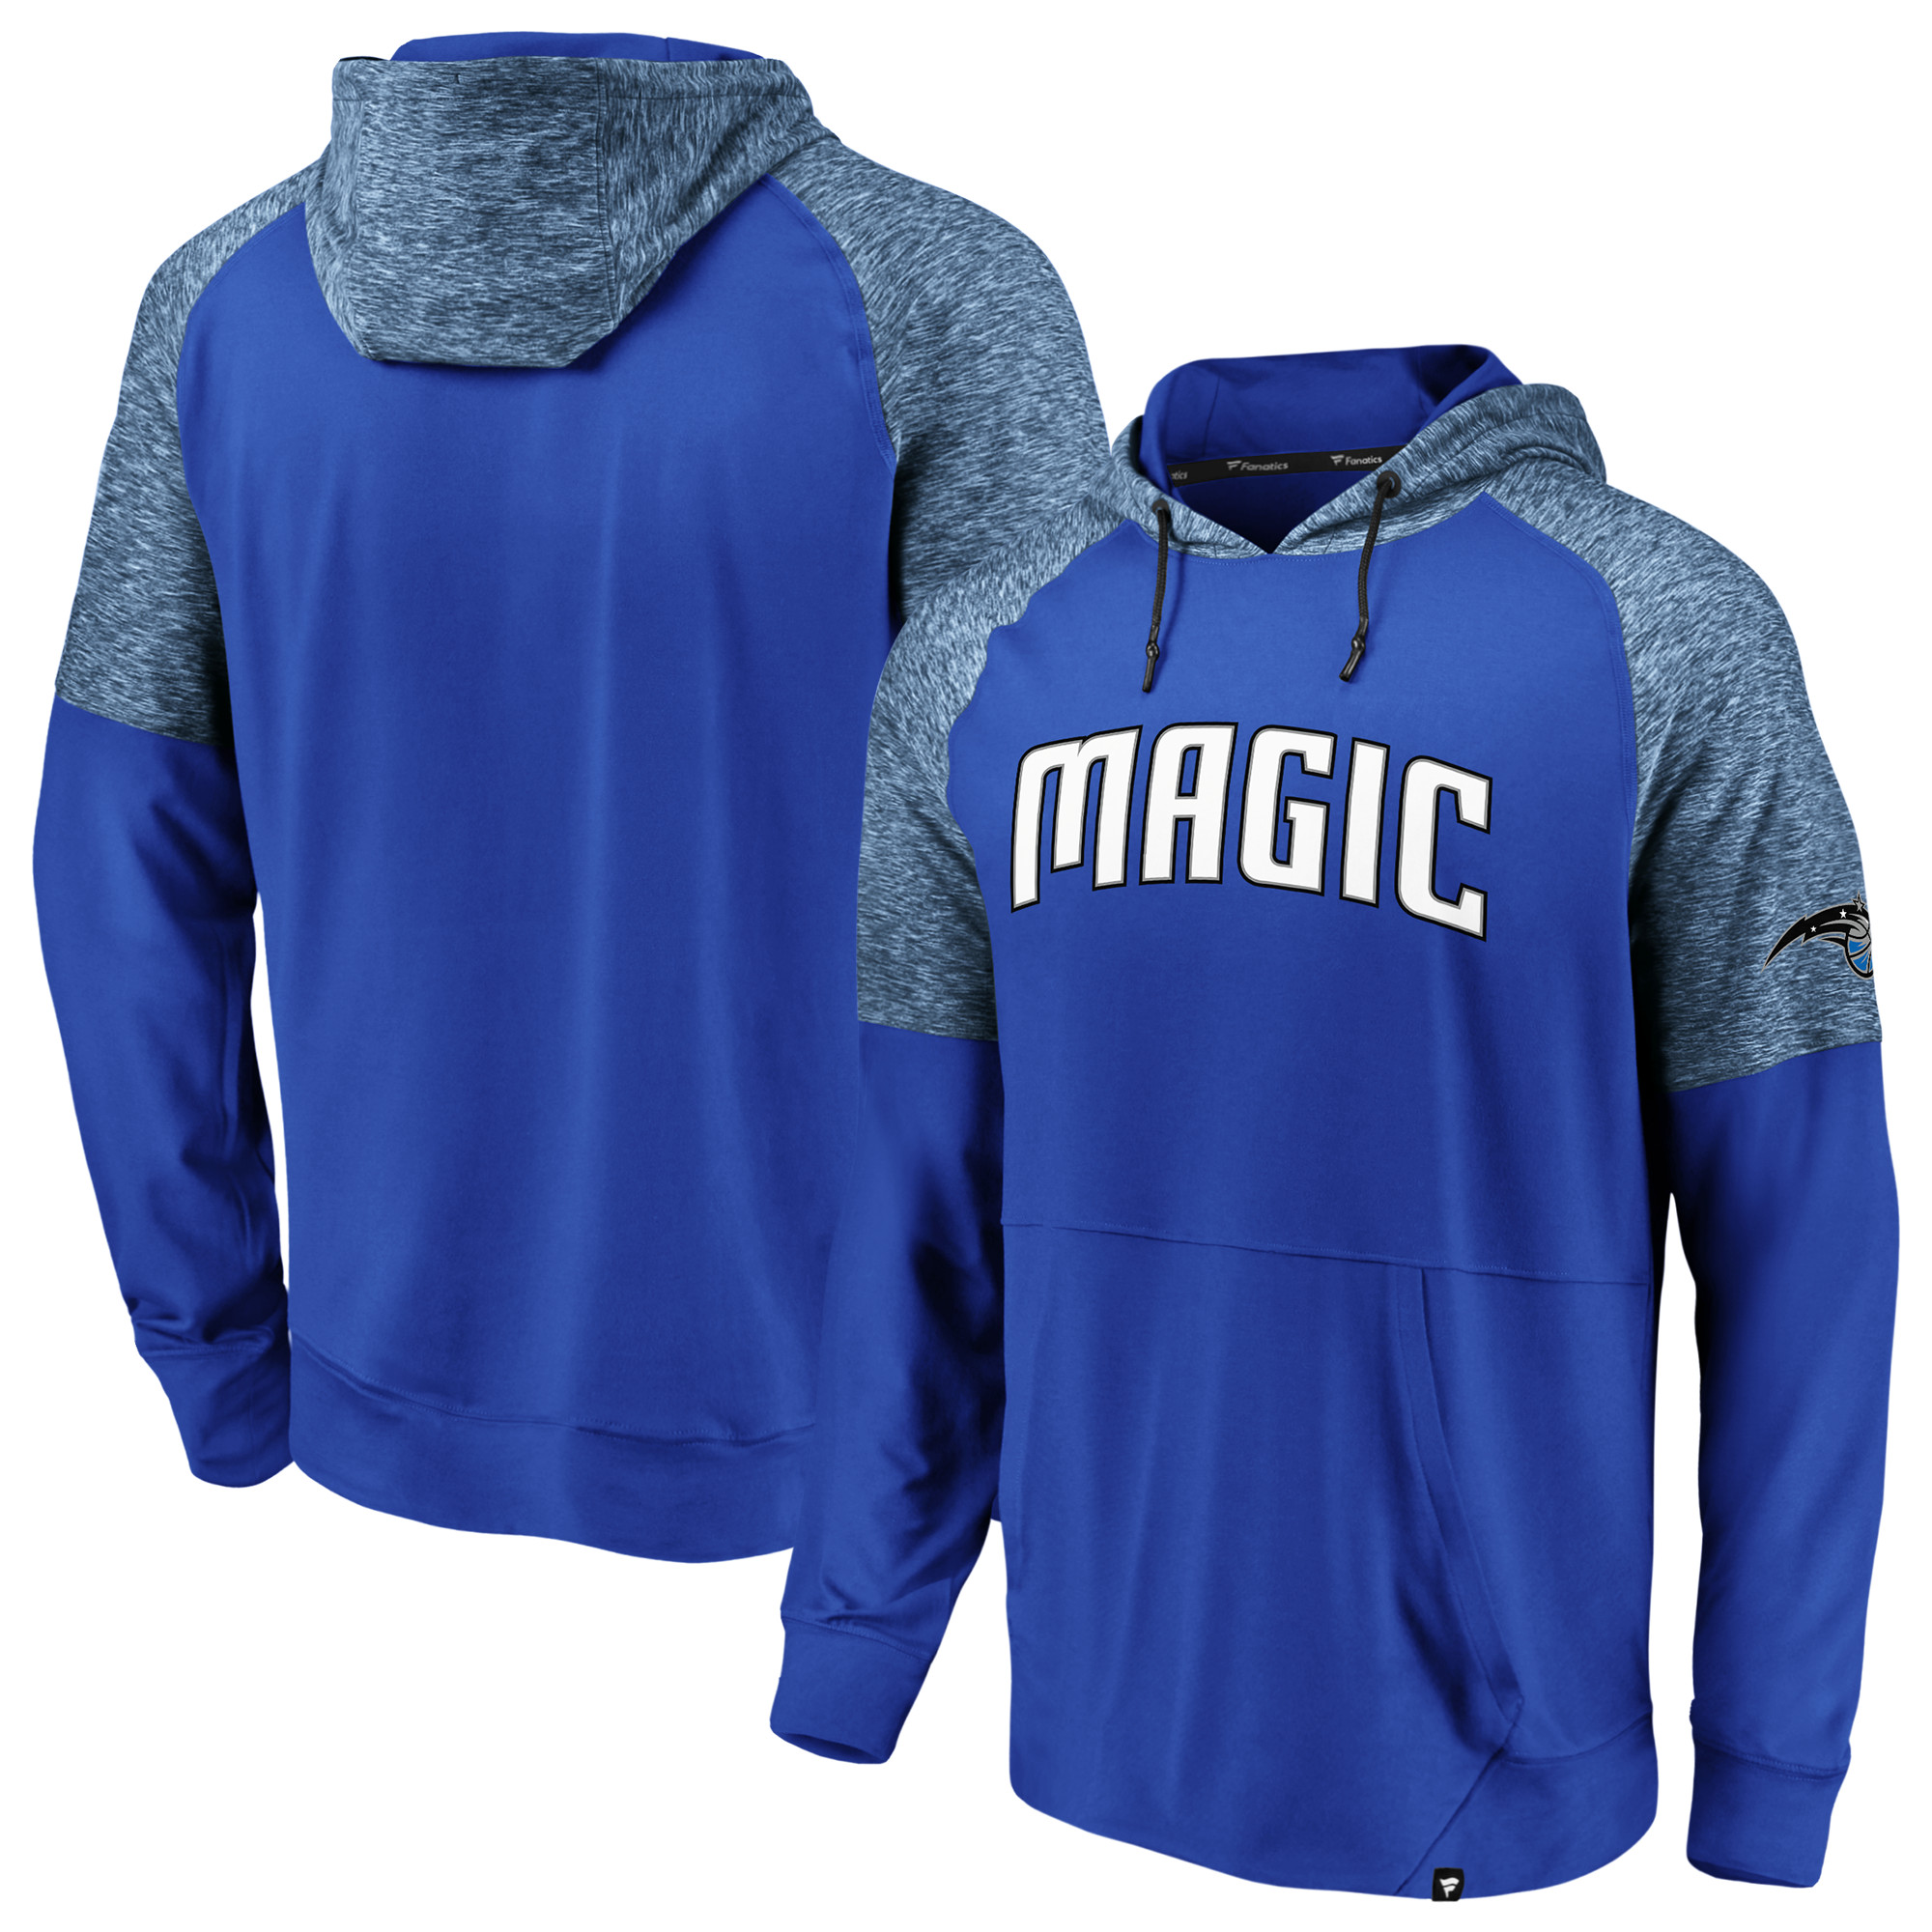 Orlando Magic Fanatics Branded Made to Move Static Performance Raglan Pullover Hoodie - Blue/Heathered Blue